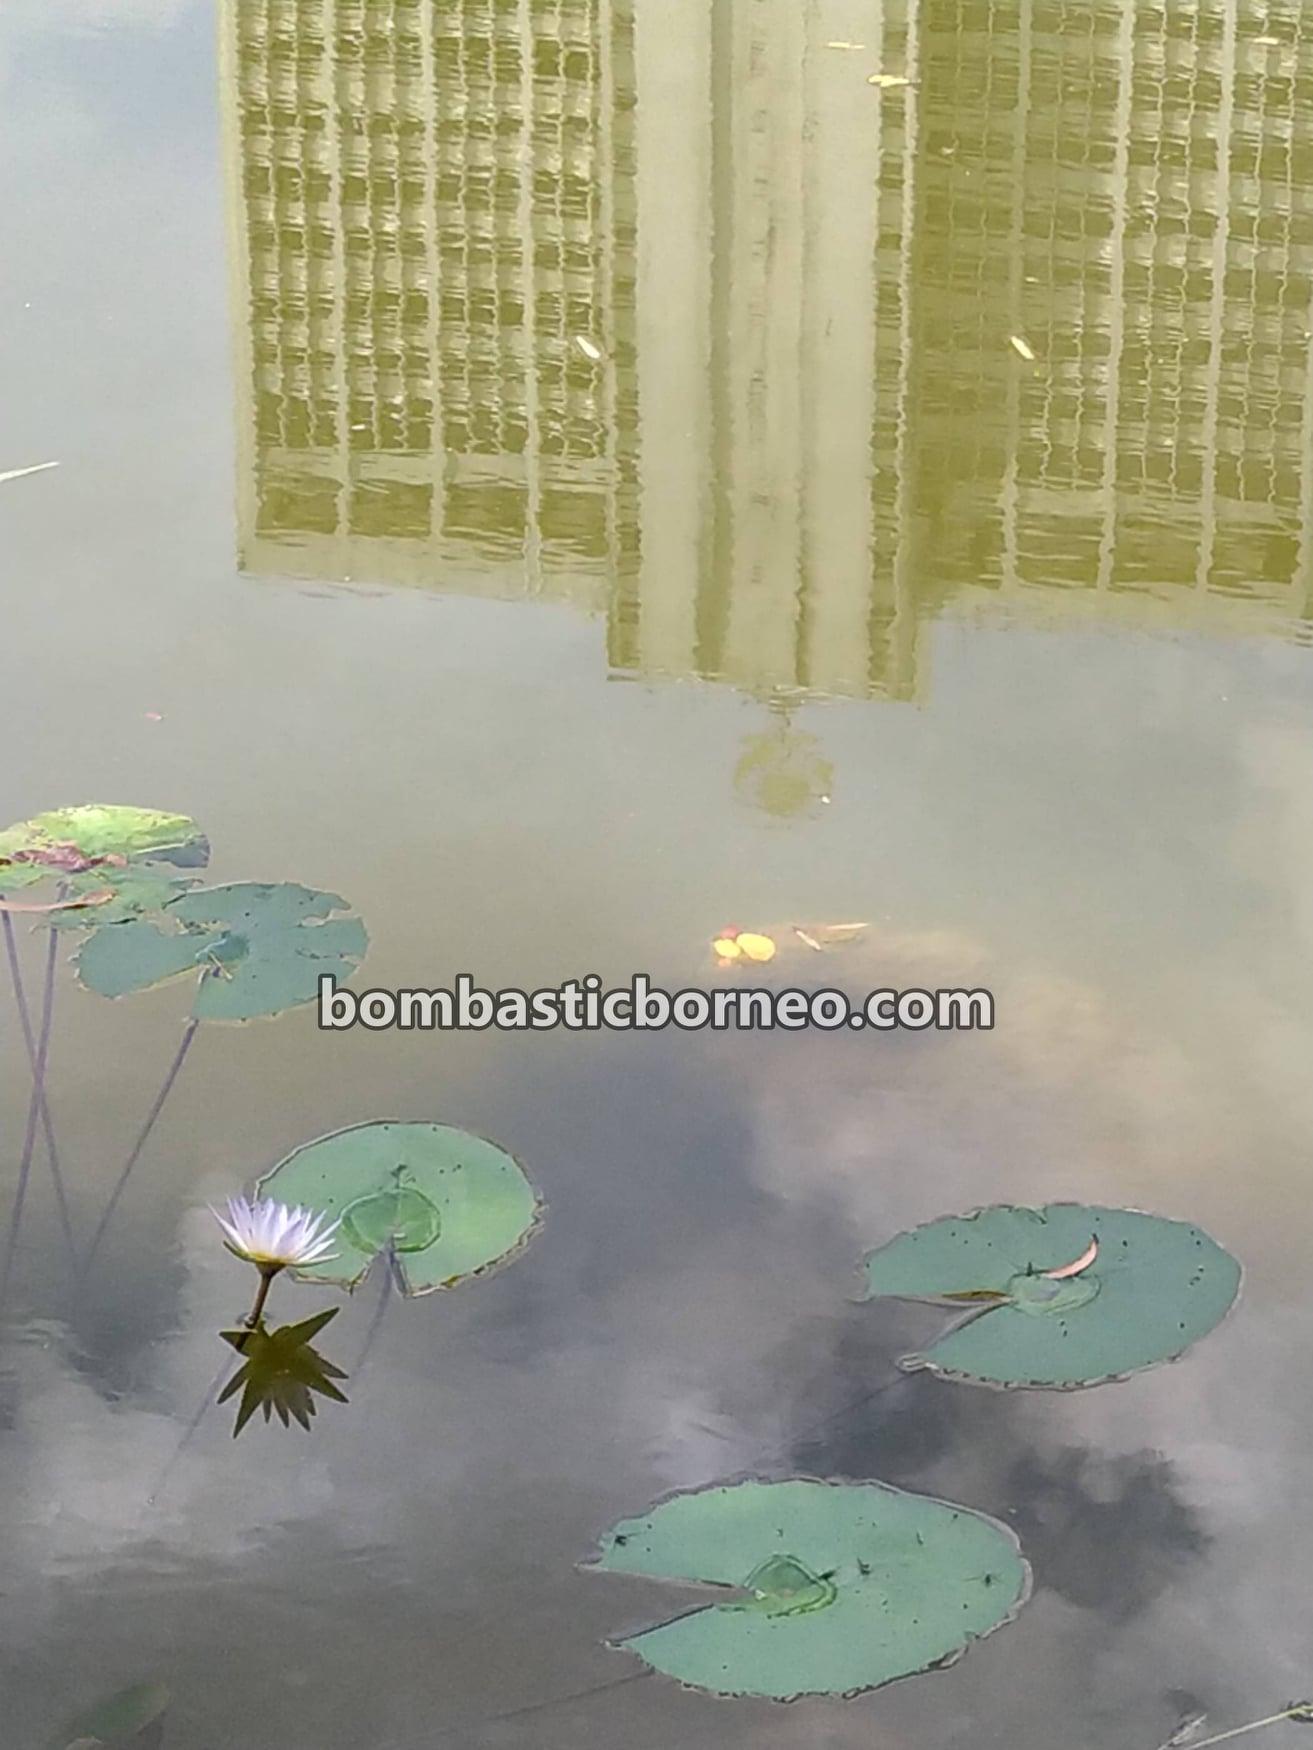 Taman Botani Sarawak, Sarawak Botanical Garden, recreational park, tempat senaman, exercise, jogging, walking, nature, Borneo, manmade lake, objek wisata, Tourism, 马来西亚砂拉越, 古晋植物园, 运动旅游景点